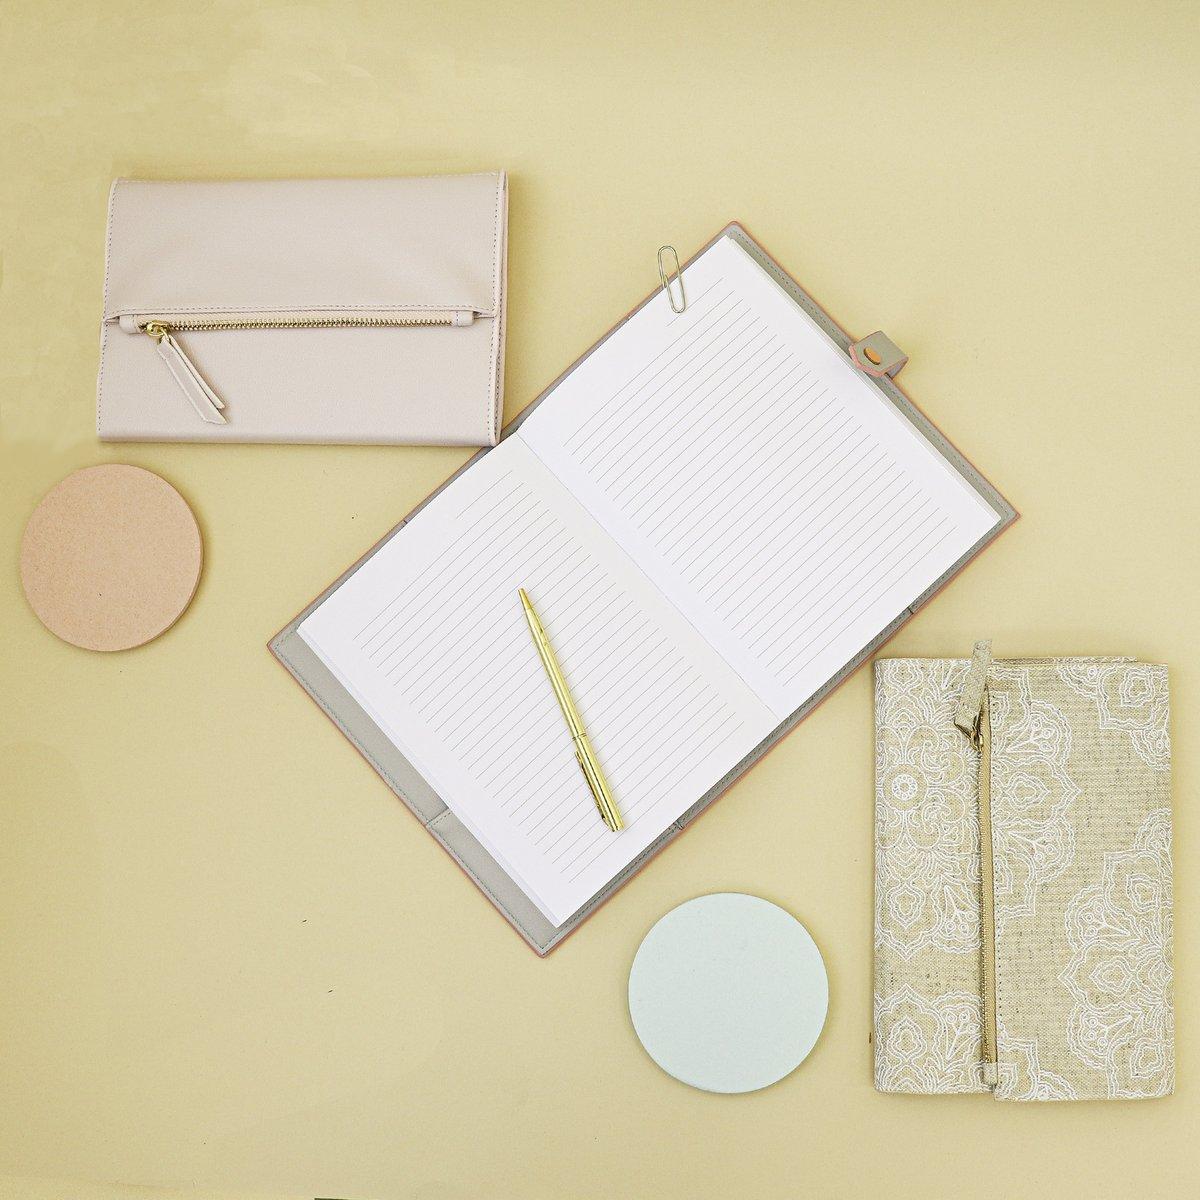 Carry your notebook around like a purse and make a statement !#GiftShed #GiftShedQA #InspireCreateShare #DohaFestivalCity #Doha #Qatar #notebook #writing #writings #sketching #qatarlife #qatari #qatargirls #qatarshopping #qatar_shoppingpic.twitter.com/YO2zxLFcA3